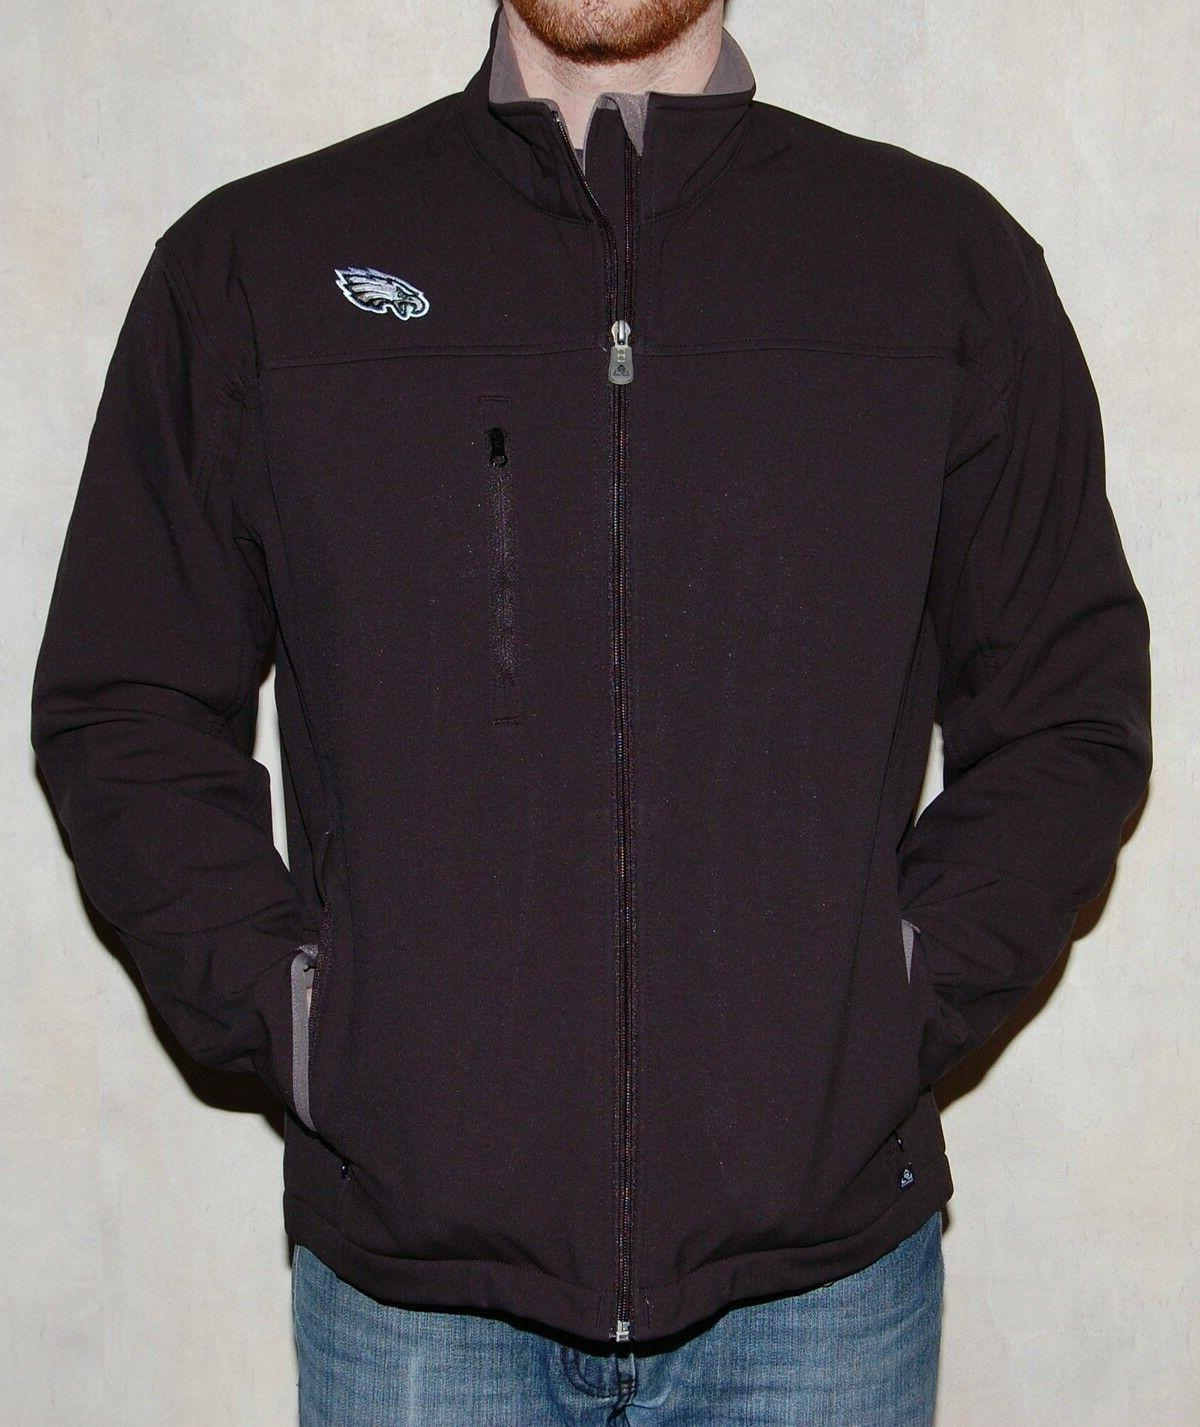 philadelphia eagles jacket full zip performance soft